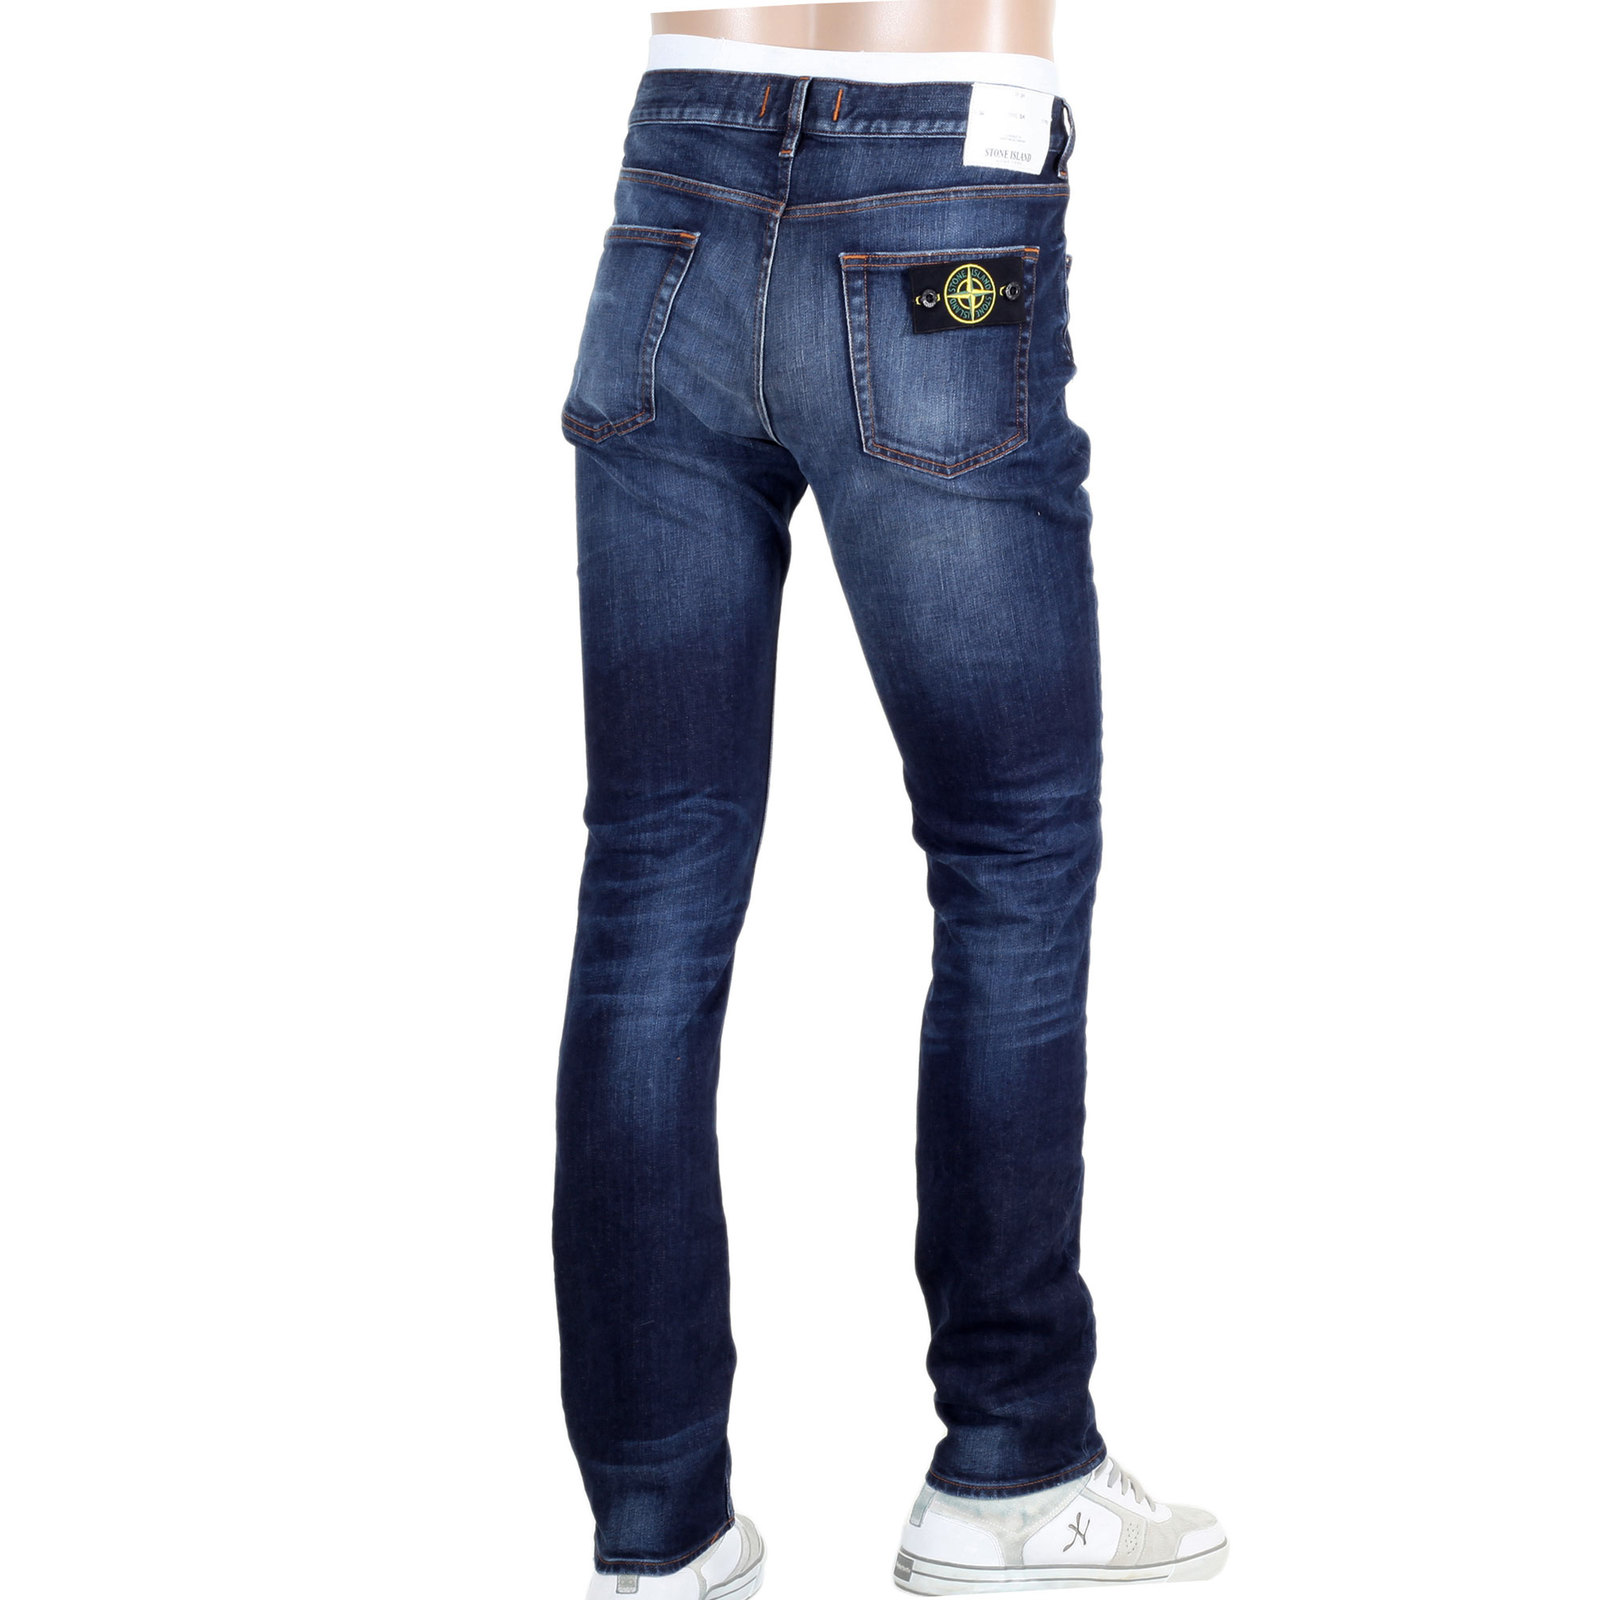 flattering style with blue skinny jeans by sugarcane uk. Black Bedroom Furniture Sets. Home Design Ideas